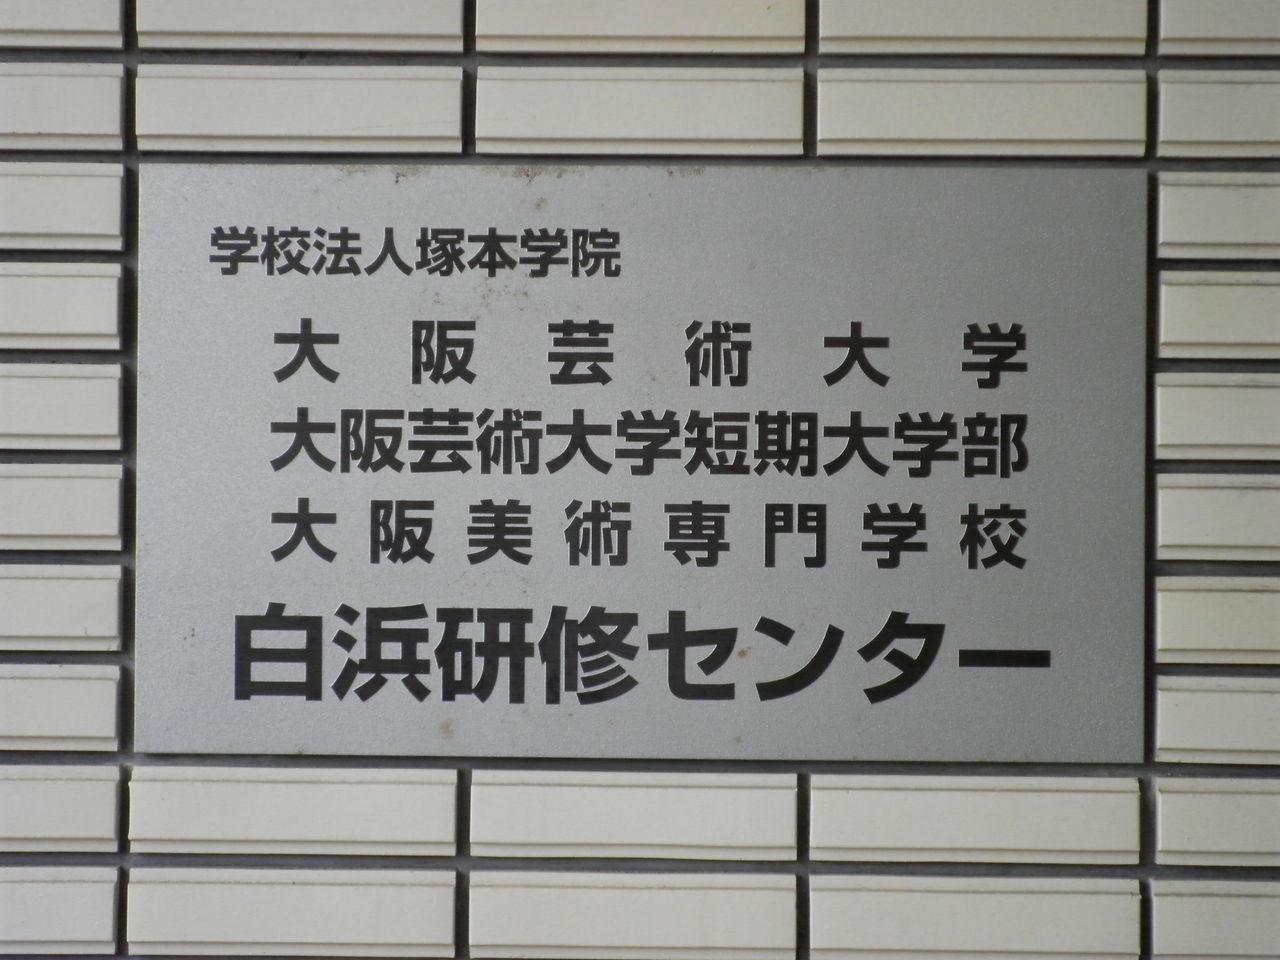 大阪芸術大学 女子駅伝部のブログ                大阪芸術大学 女子...